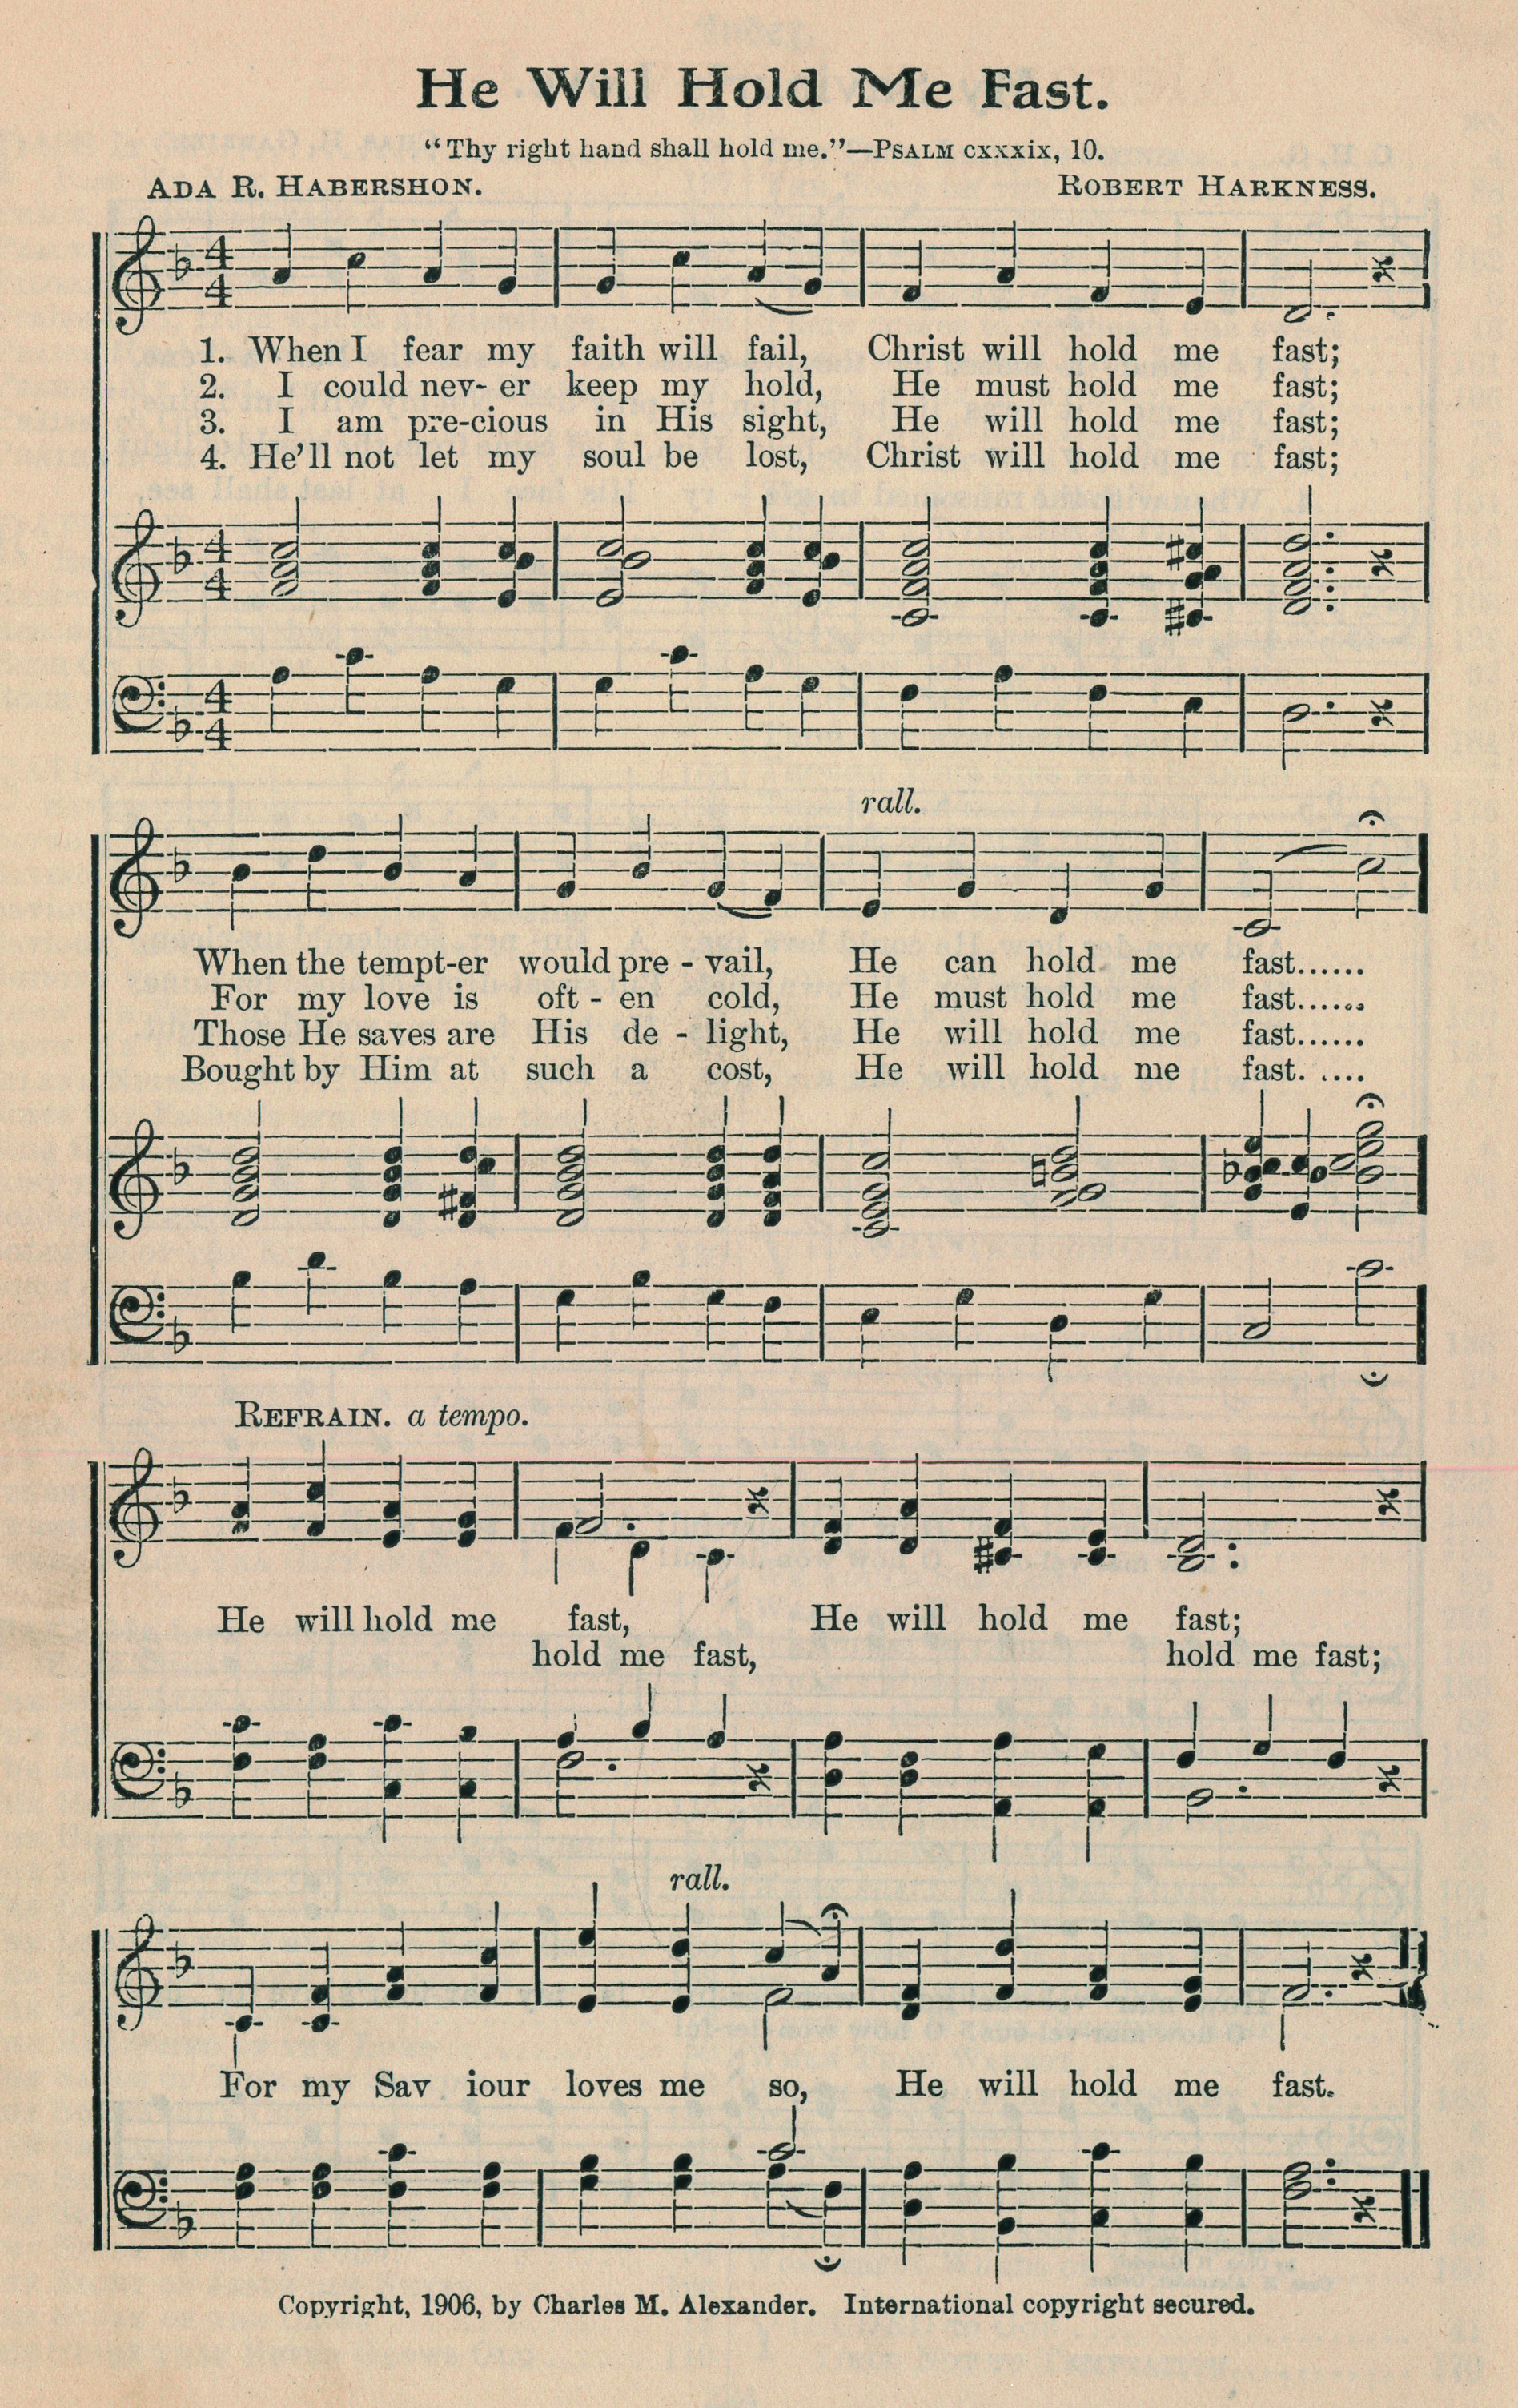 Fig. 1.   Northfield Hymnal with Alexander's Supplement  (Chicago: Biglow & Main, 1907).